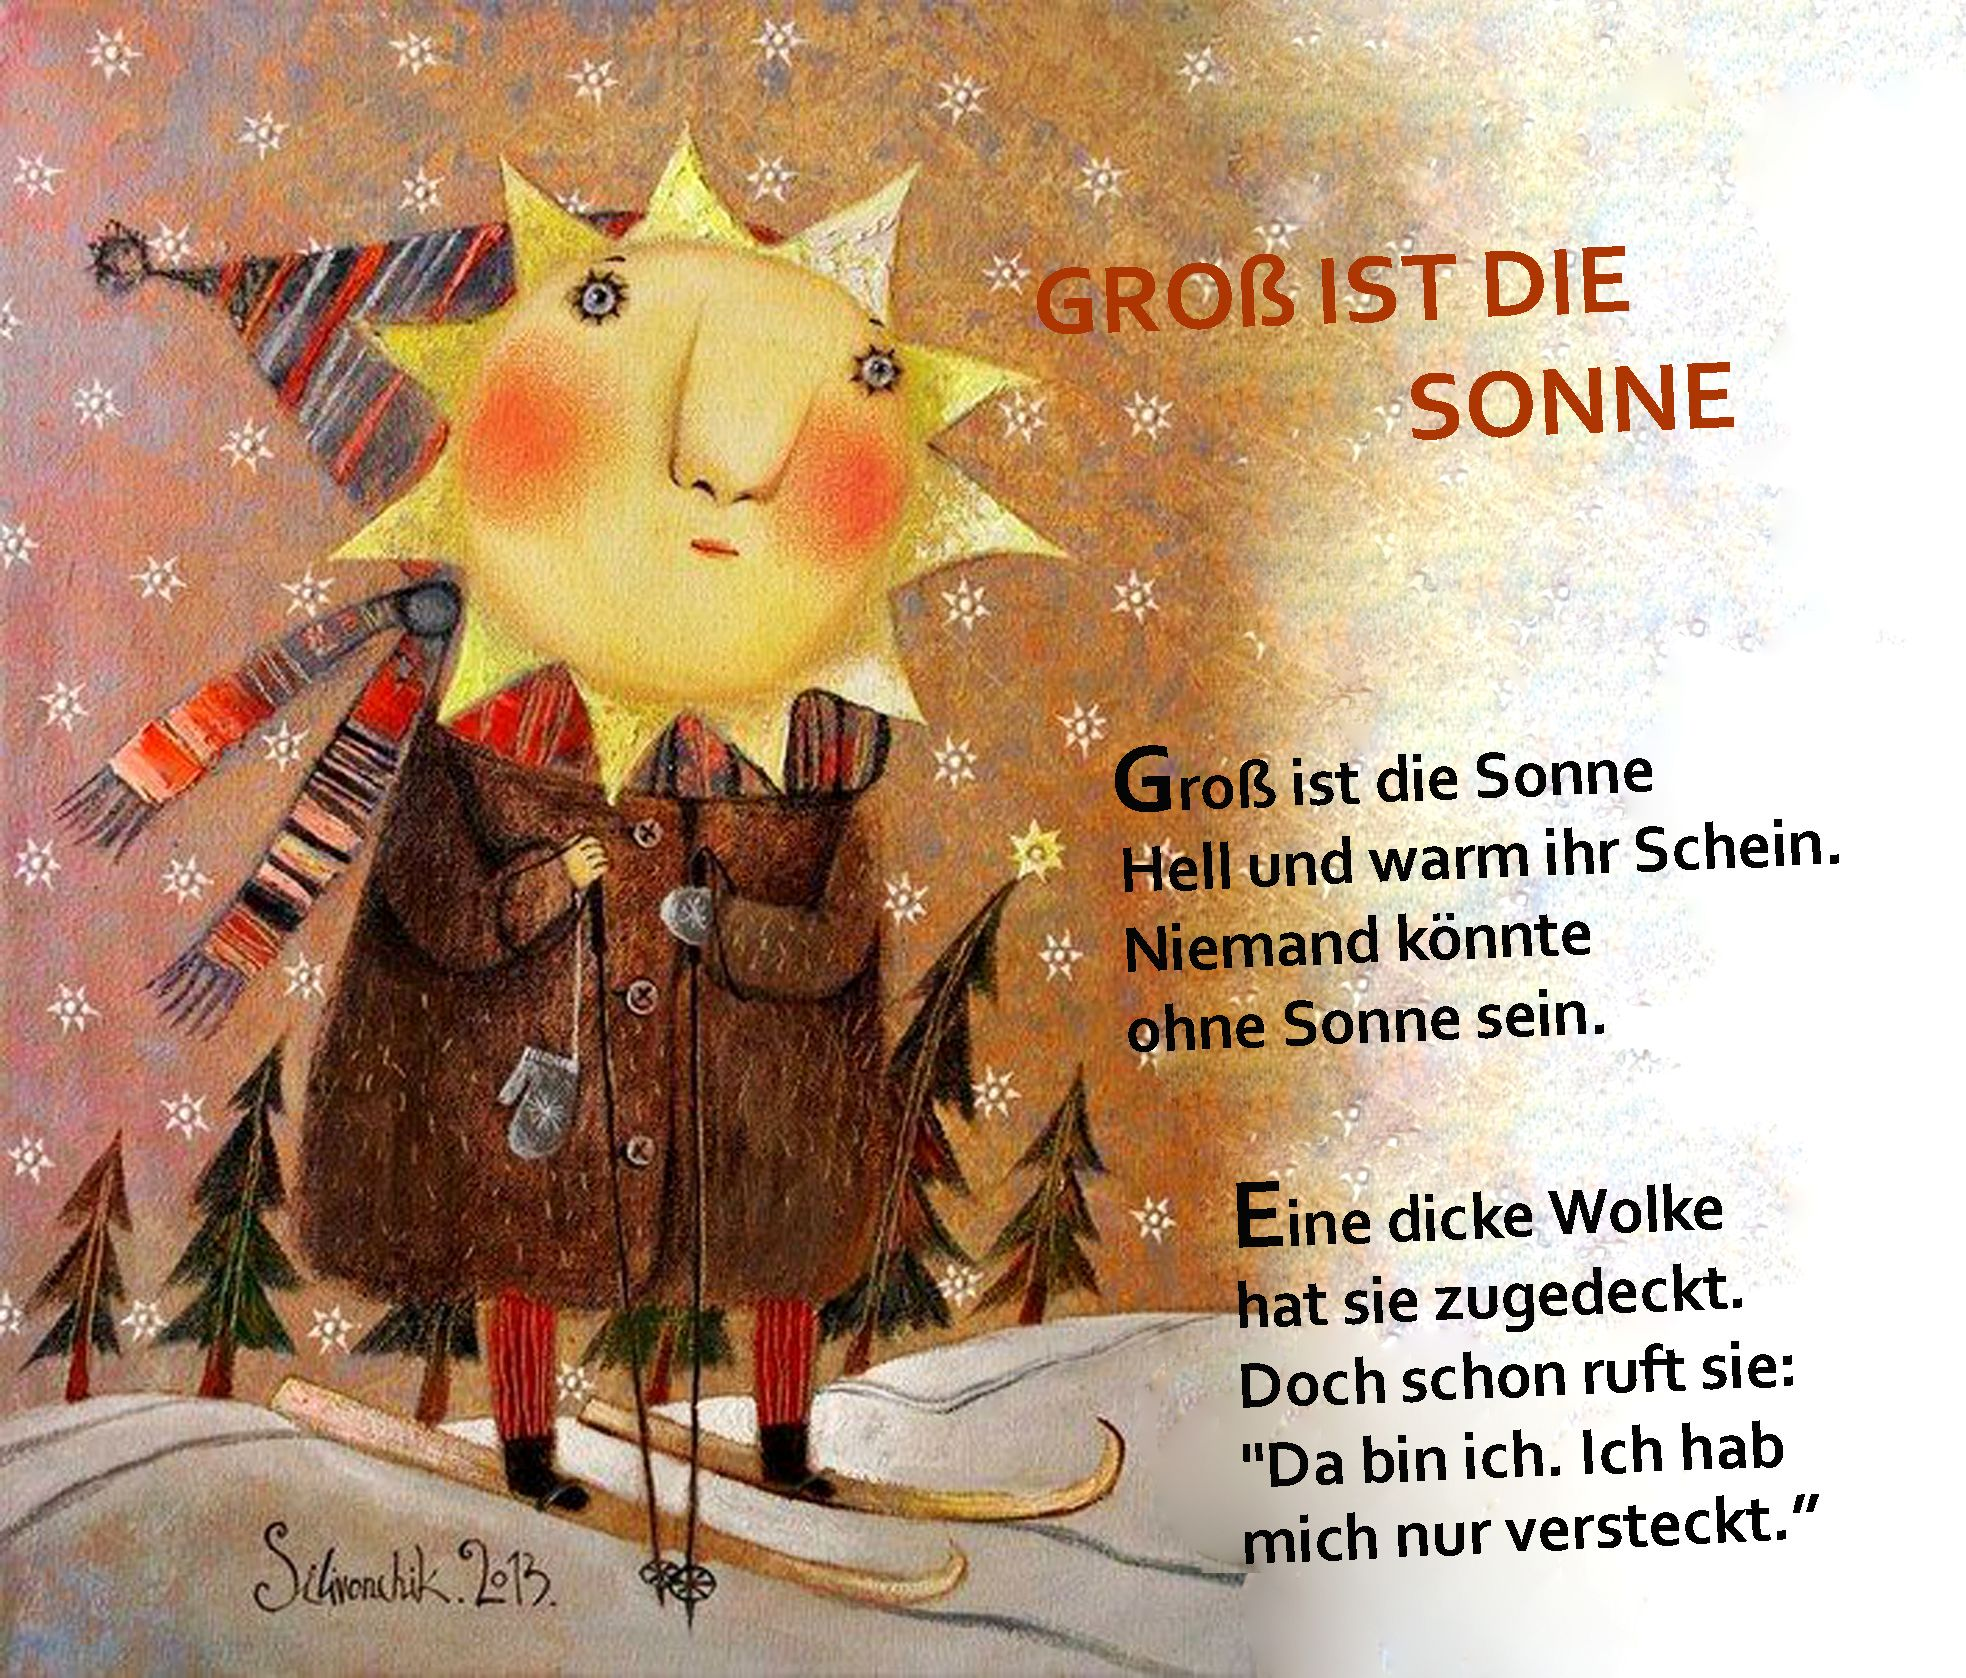 Wetter Umwelterziehung Sonne Kindergarten Gedicht Reim Kita Erzieherin Erziehung Fingerspiele Kinder Gedichte Gedichte Fur Kinder